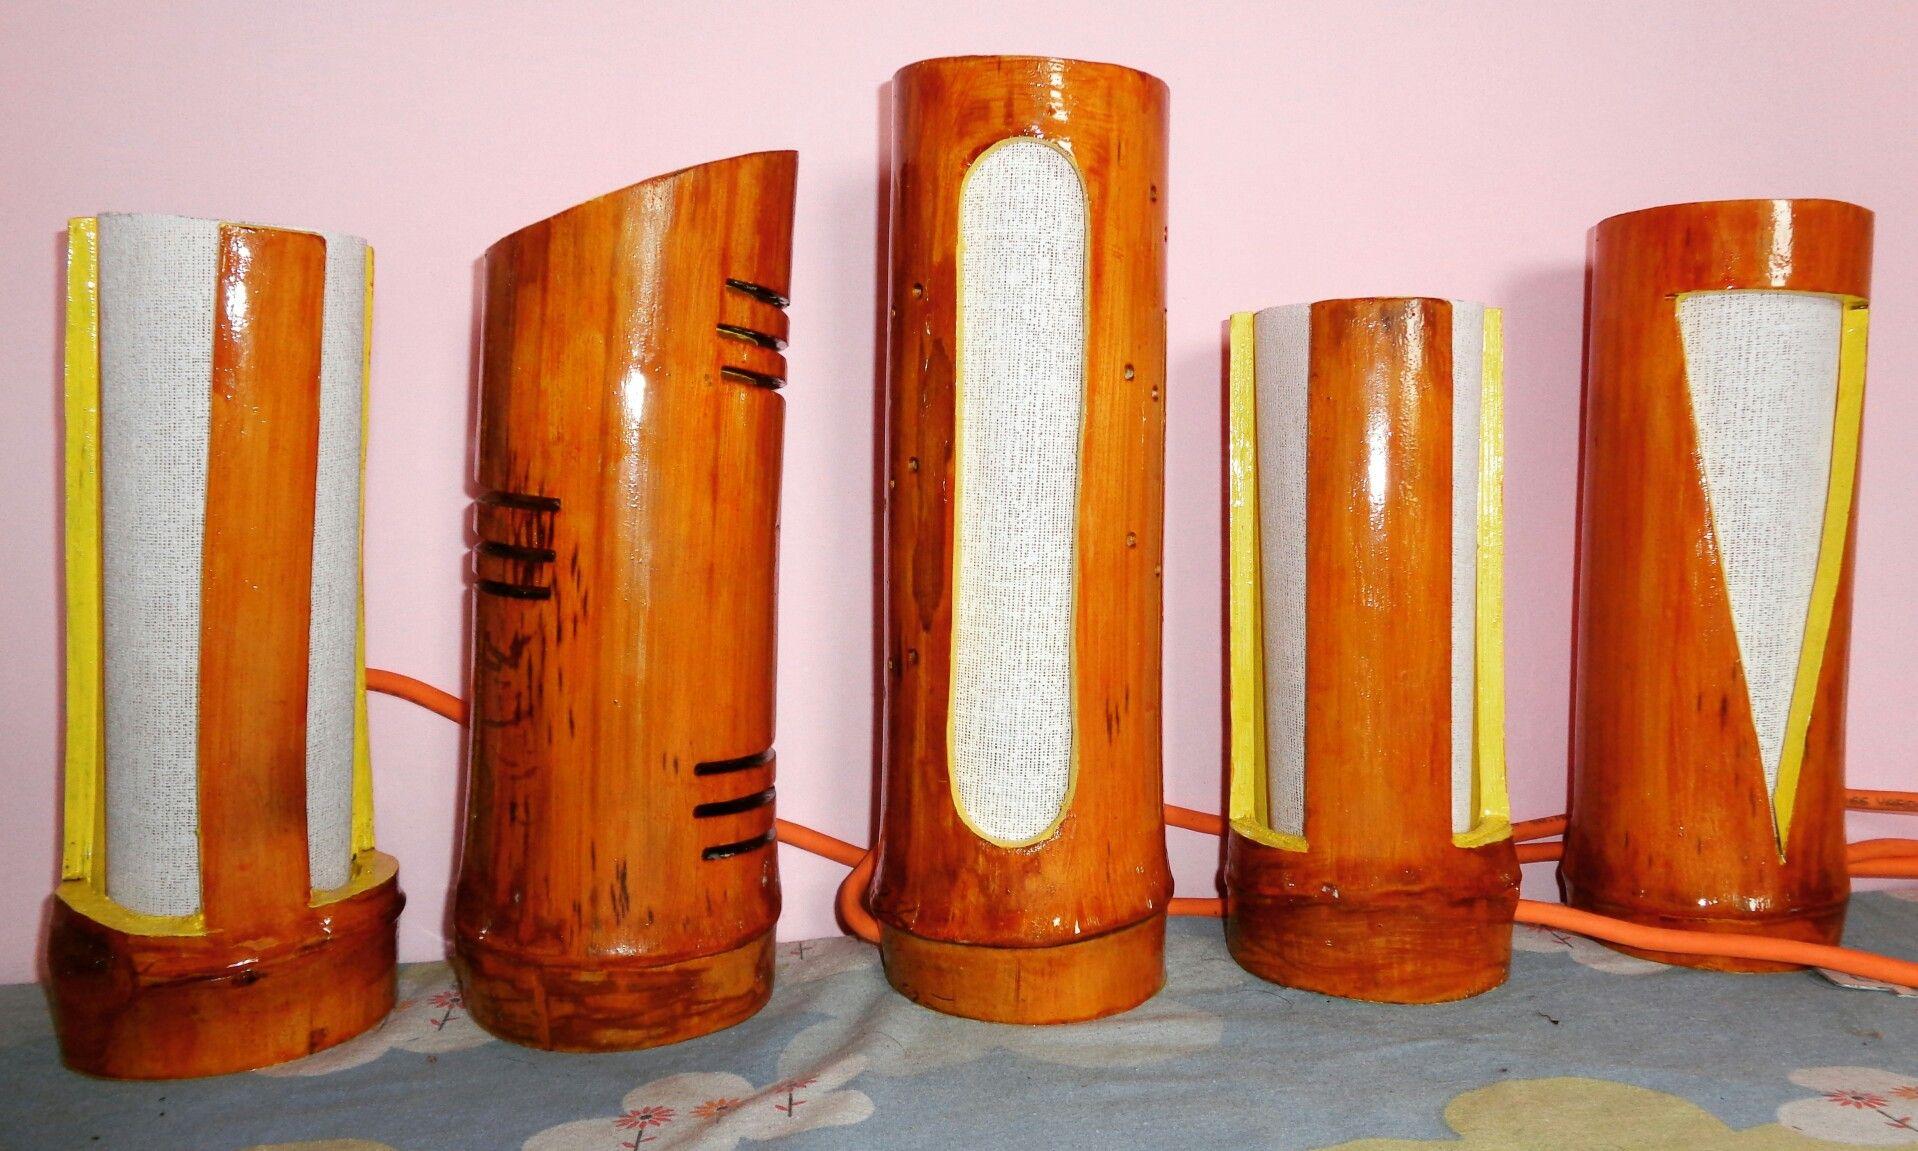 Handmade bamboo lights...